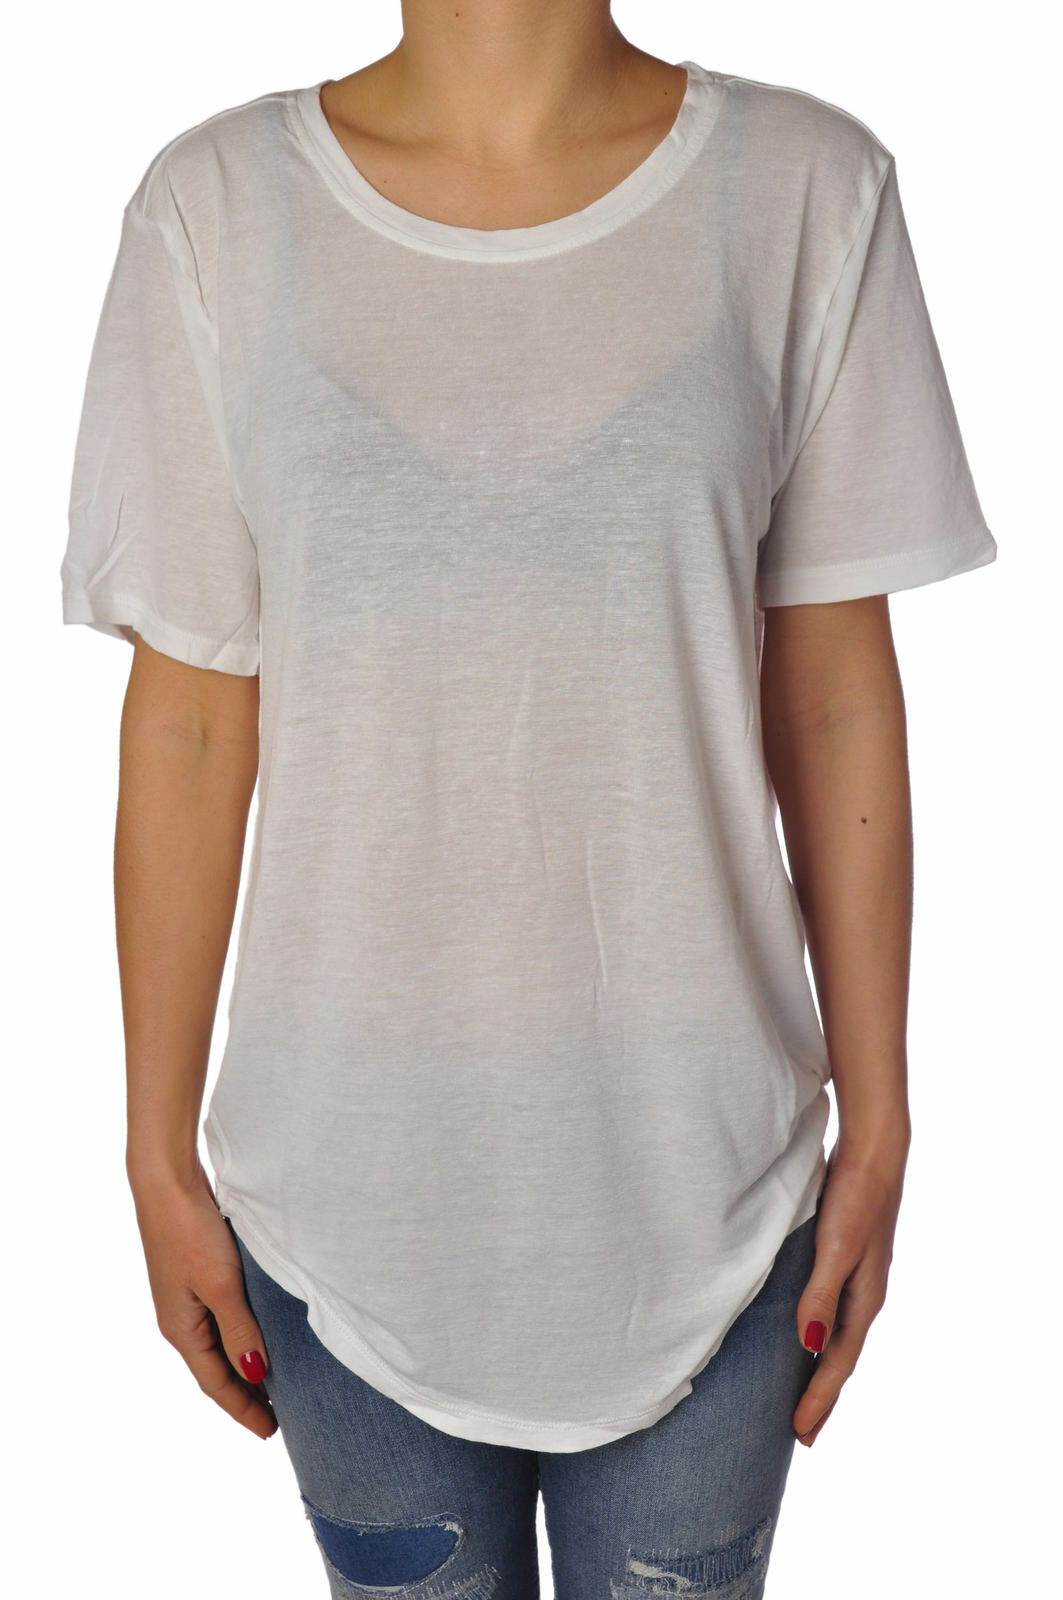 Soallure - Topwear-T-shirts - woman - 773417C184011